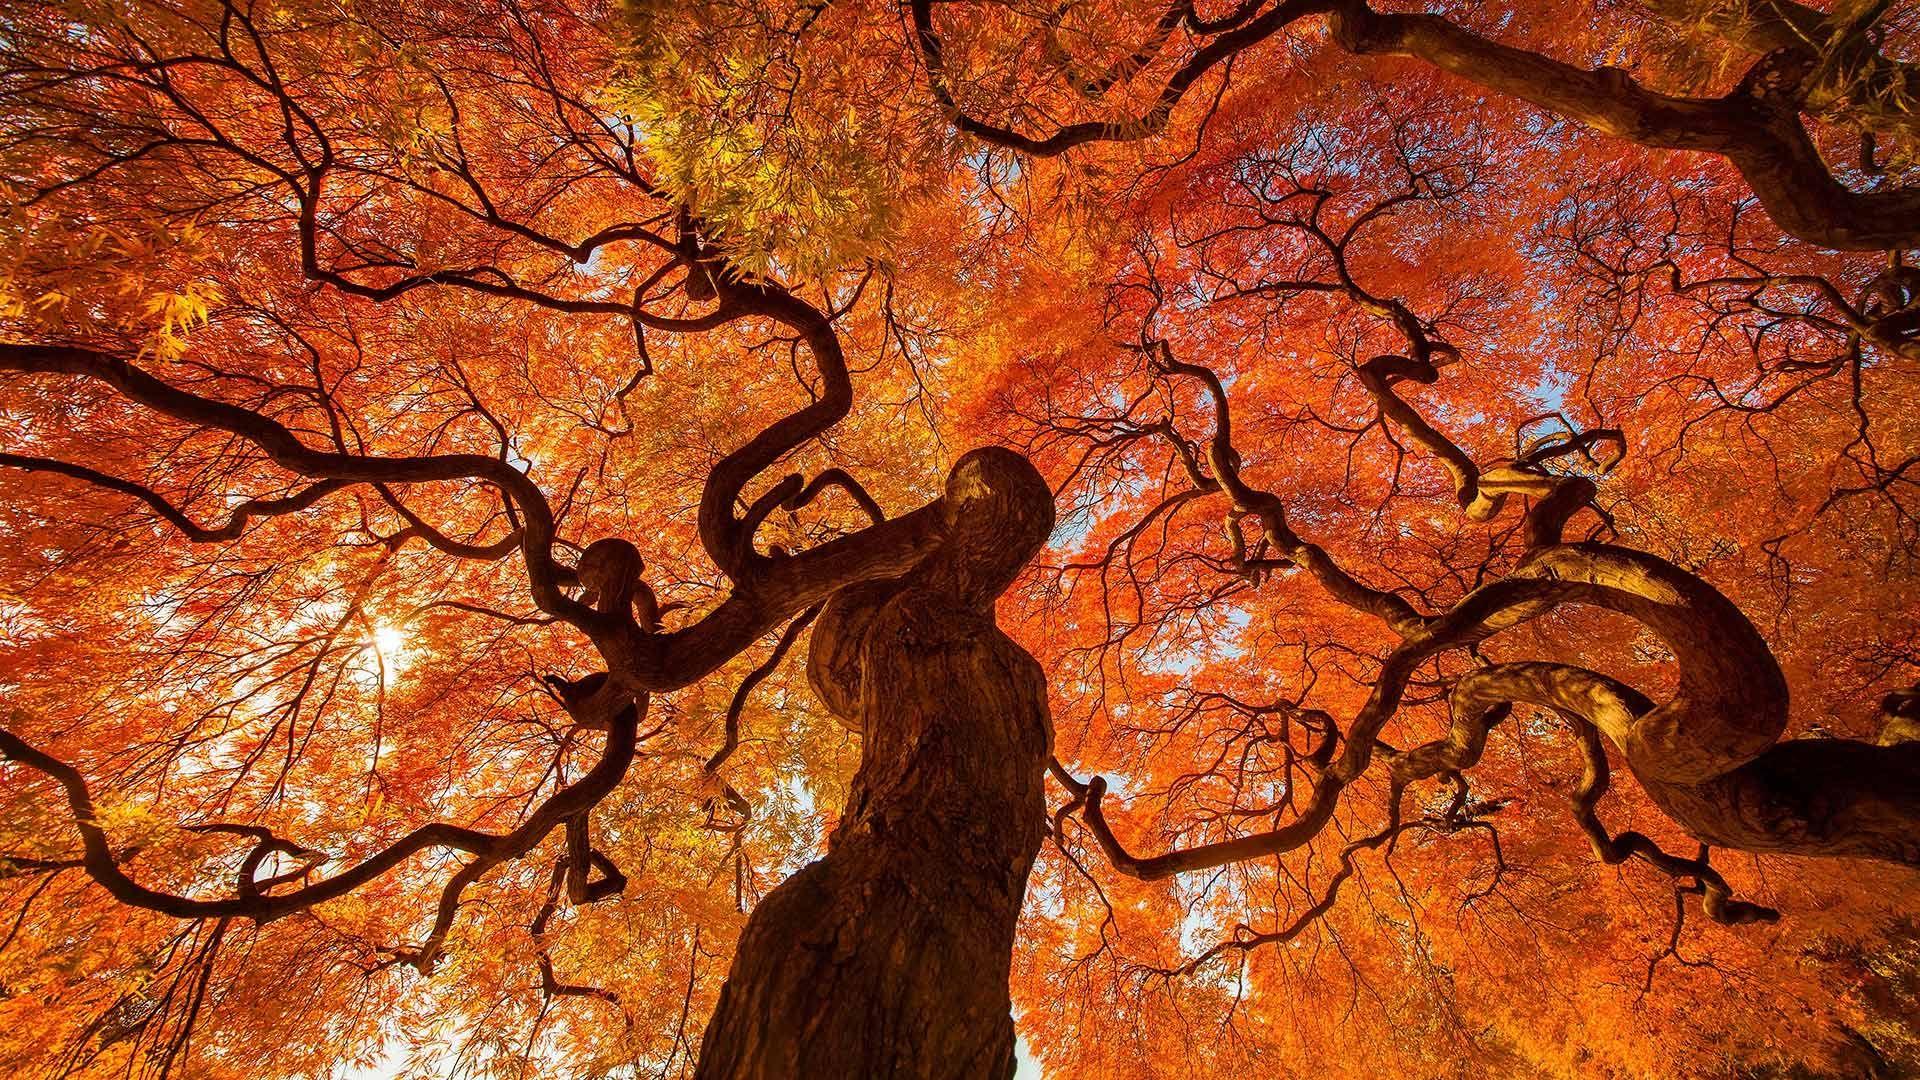 Huge Wallpaper Dump Windows 10 Lock Screen Images 1920 X 1080 Autumn Trees Photo Tree Nature Wallpaper